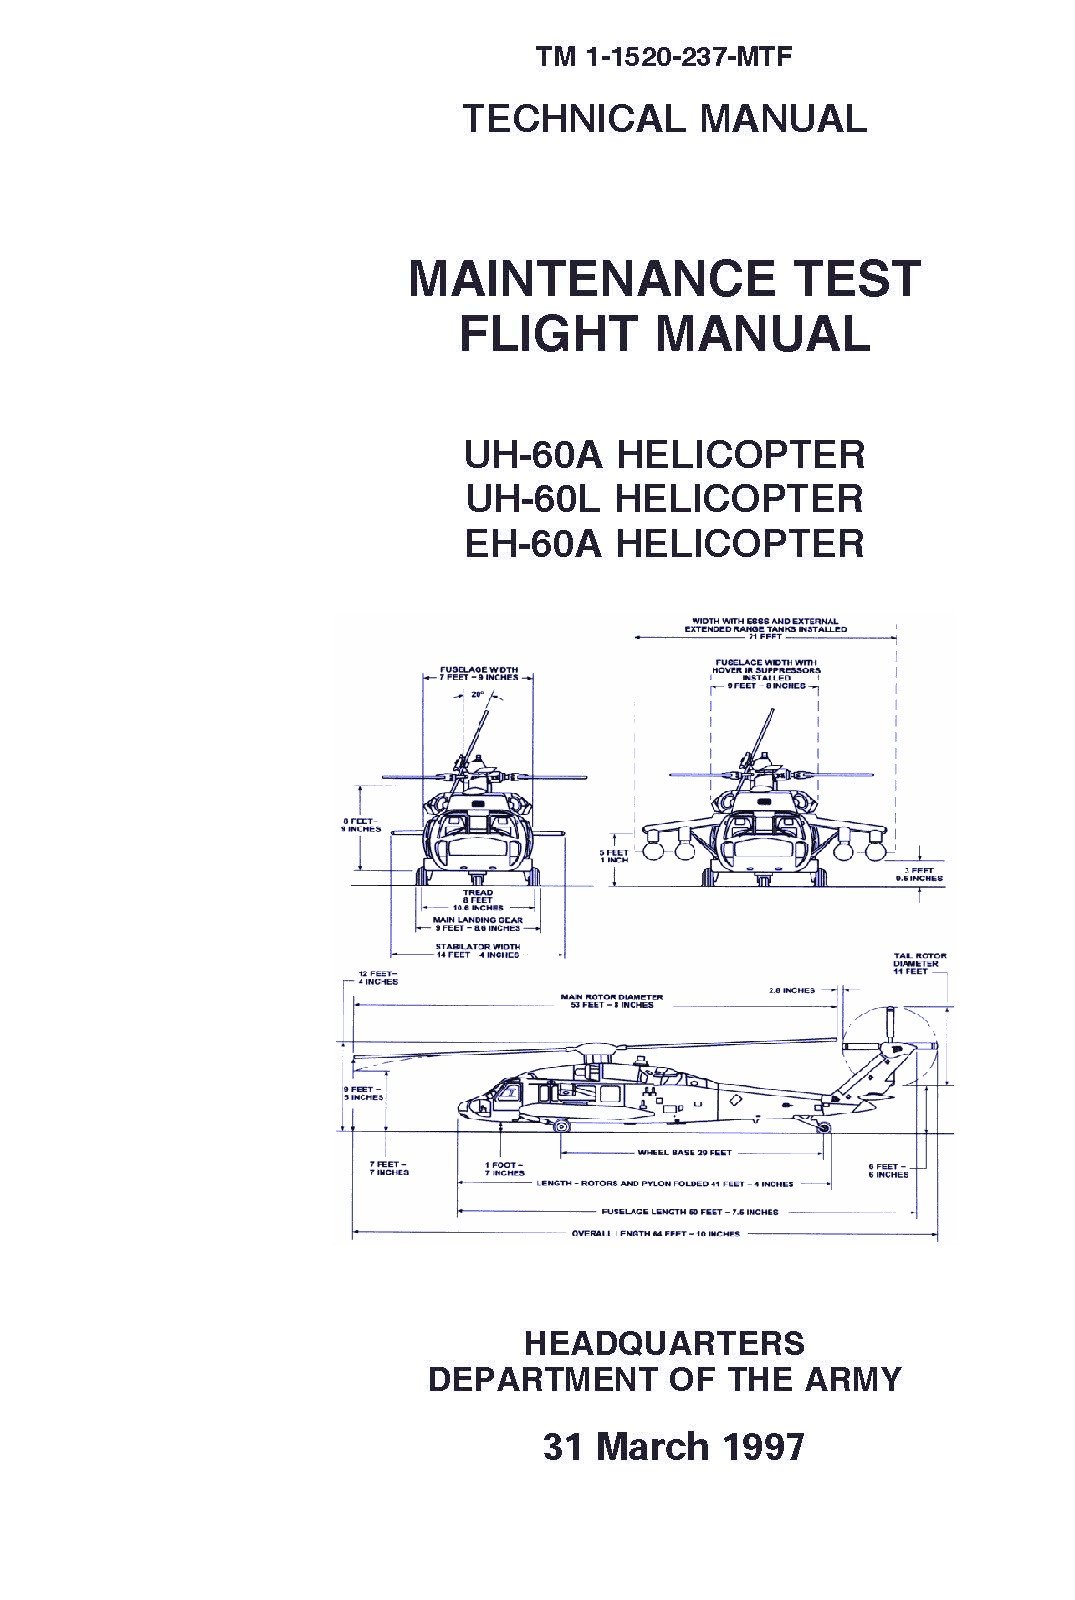 tm 1 1520 237 mtf technical manual maintenance test flight manual uh rh amazon com uh-60 maintenance manual UH-60 Black Hawk Helicopter